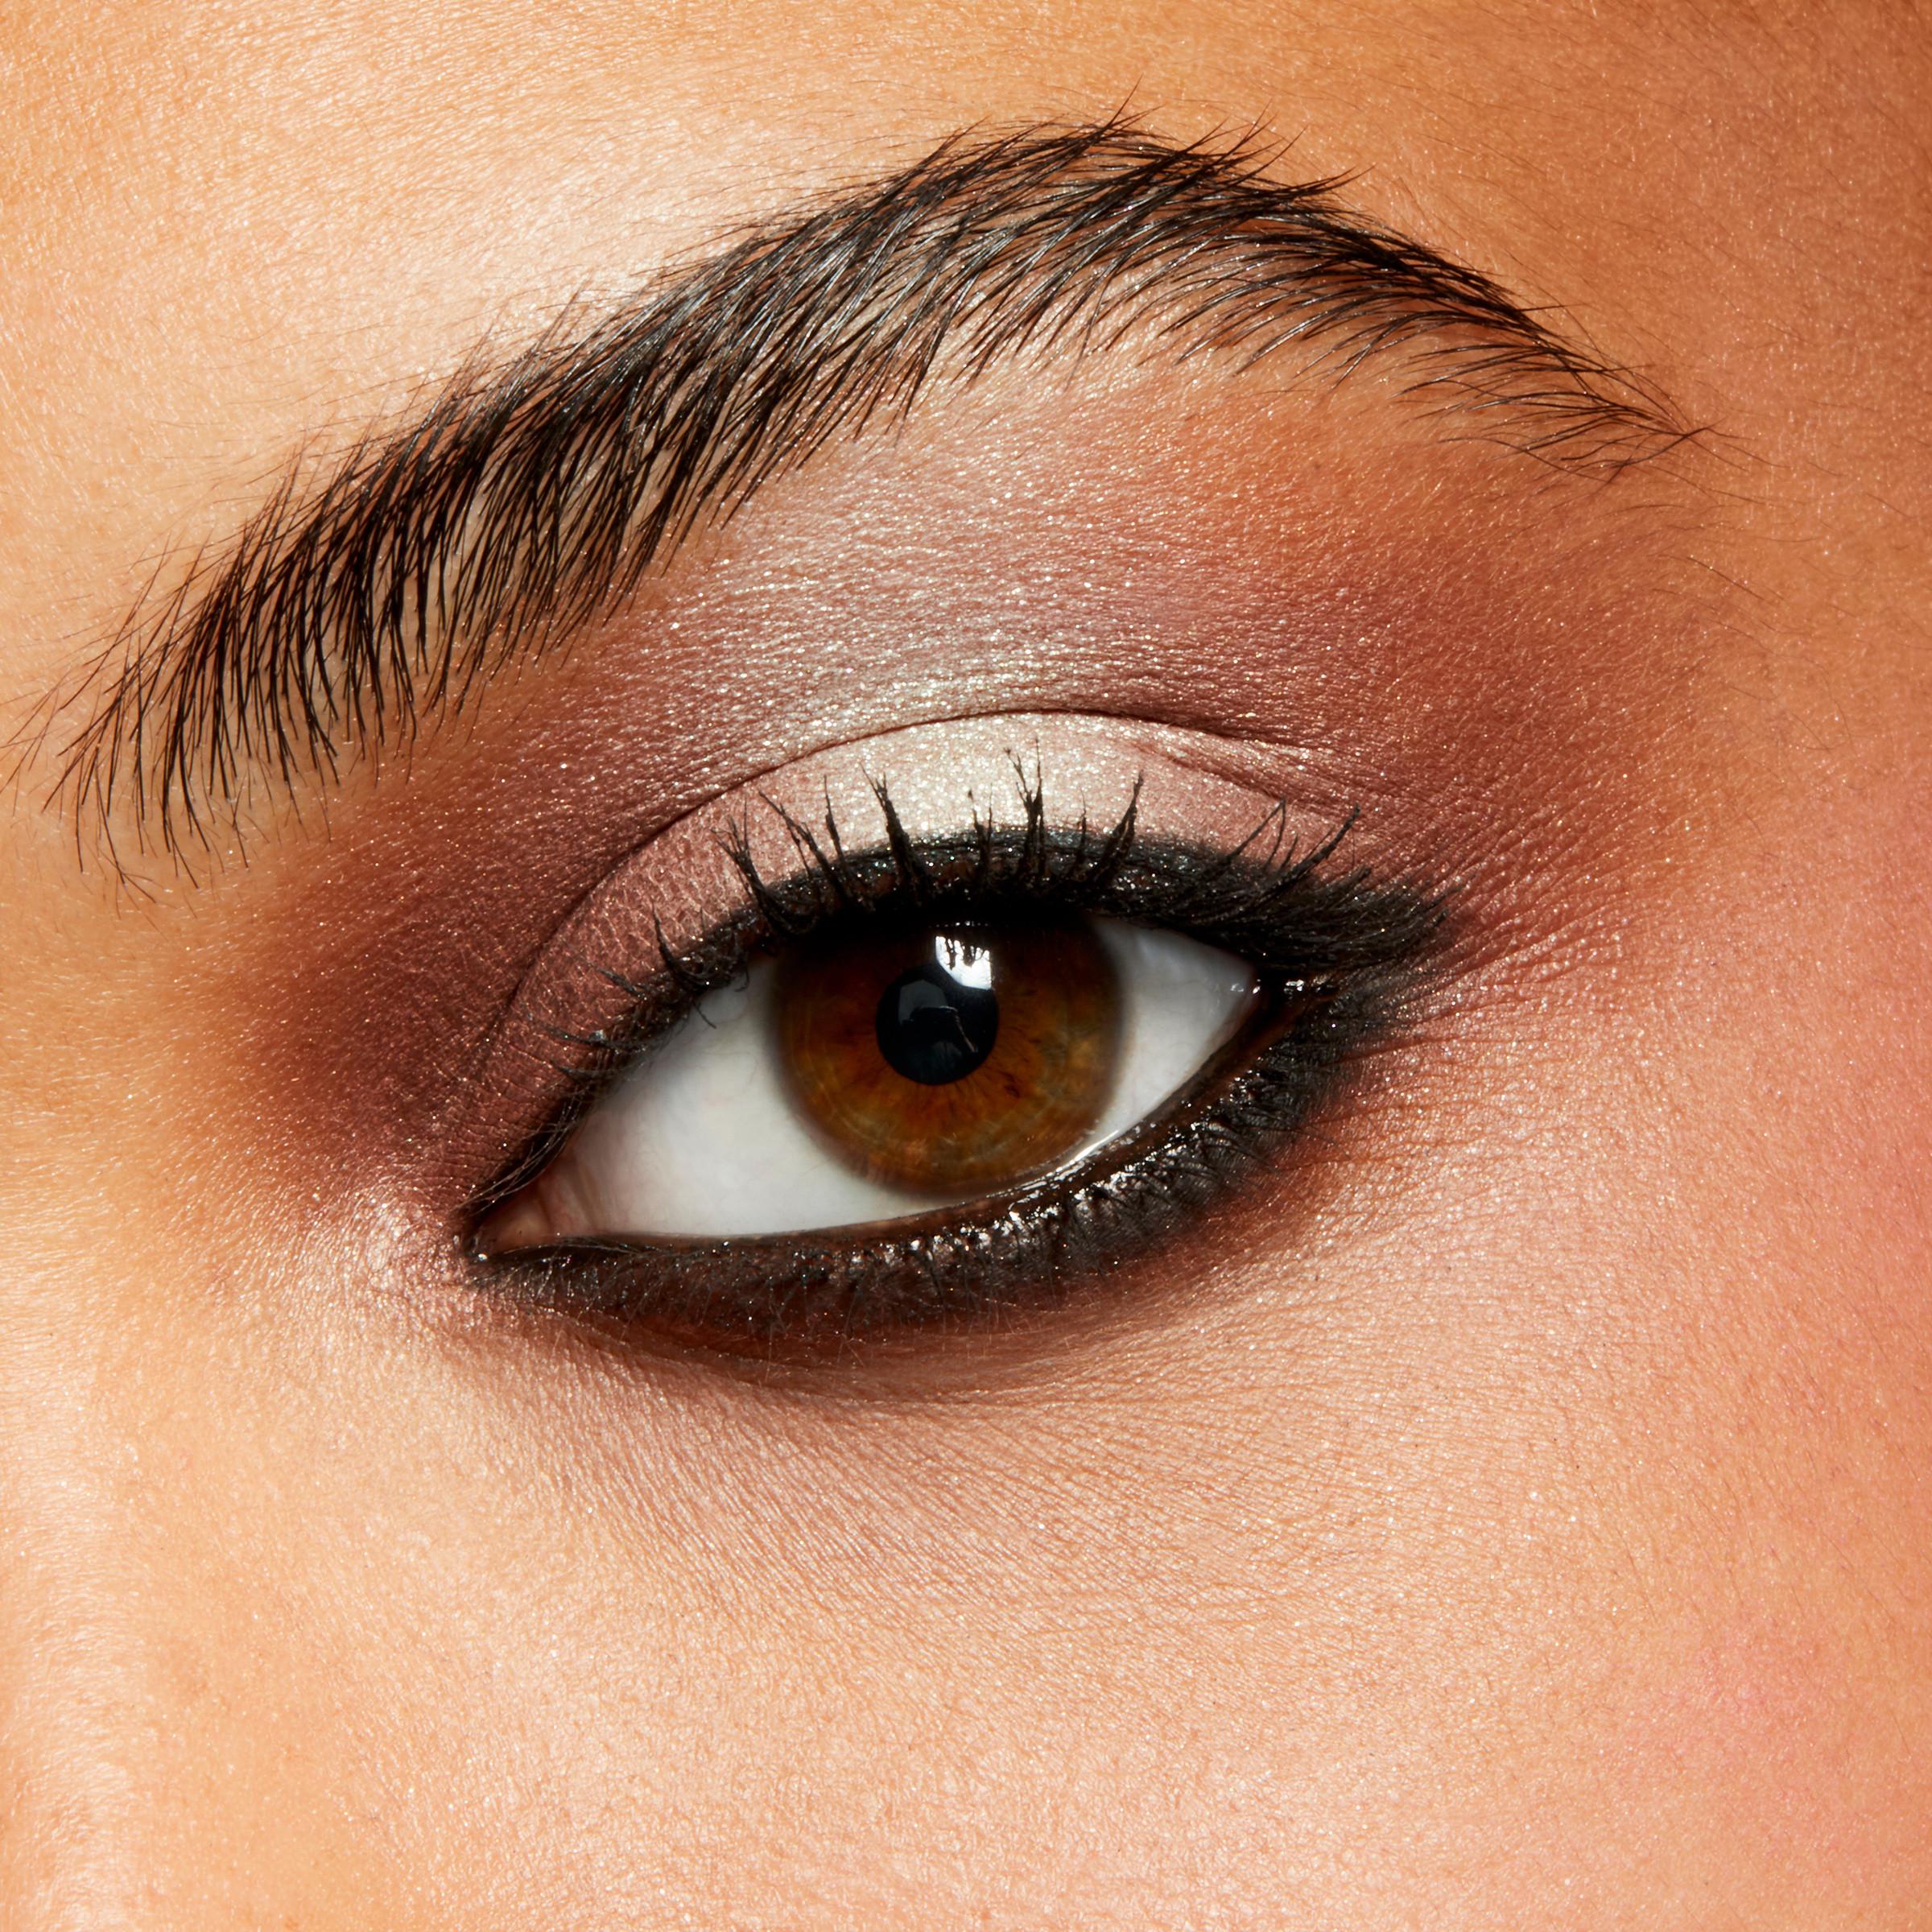 Dual Dare Wp Eye Liner - Black, DUAL DARE ALL DAY WATERPROOF LINER, large image number 2